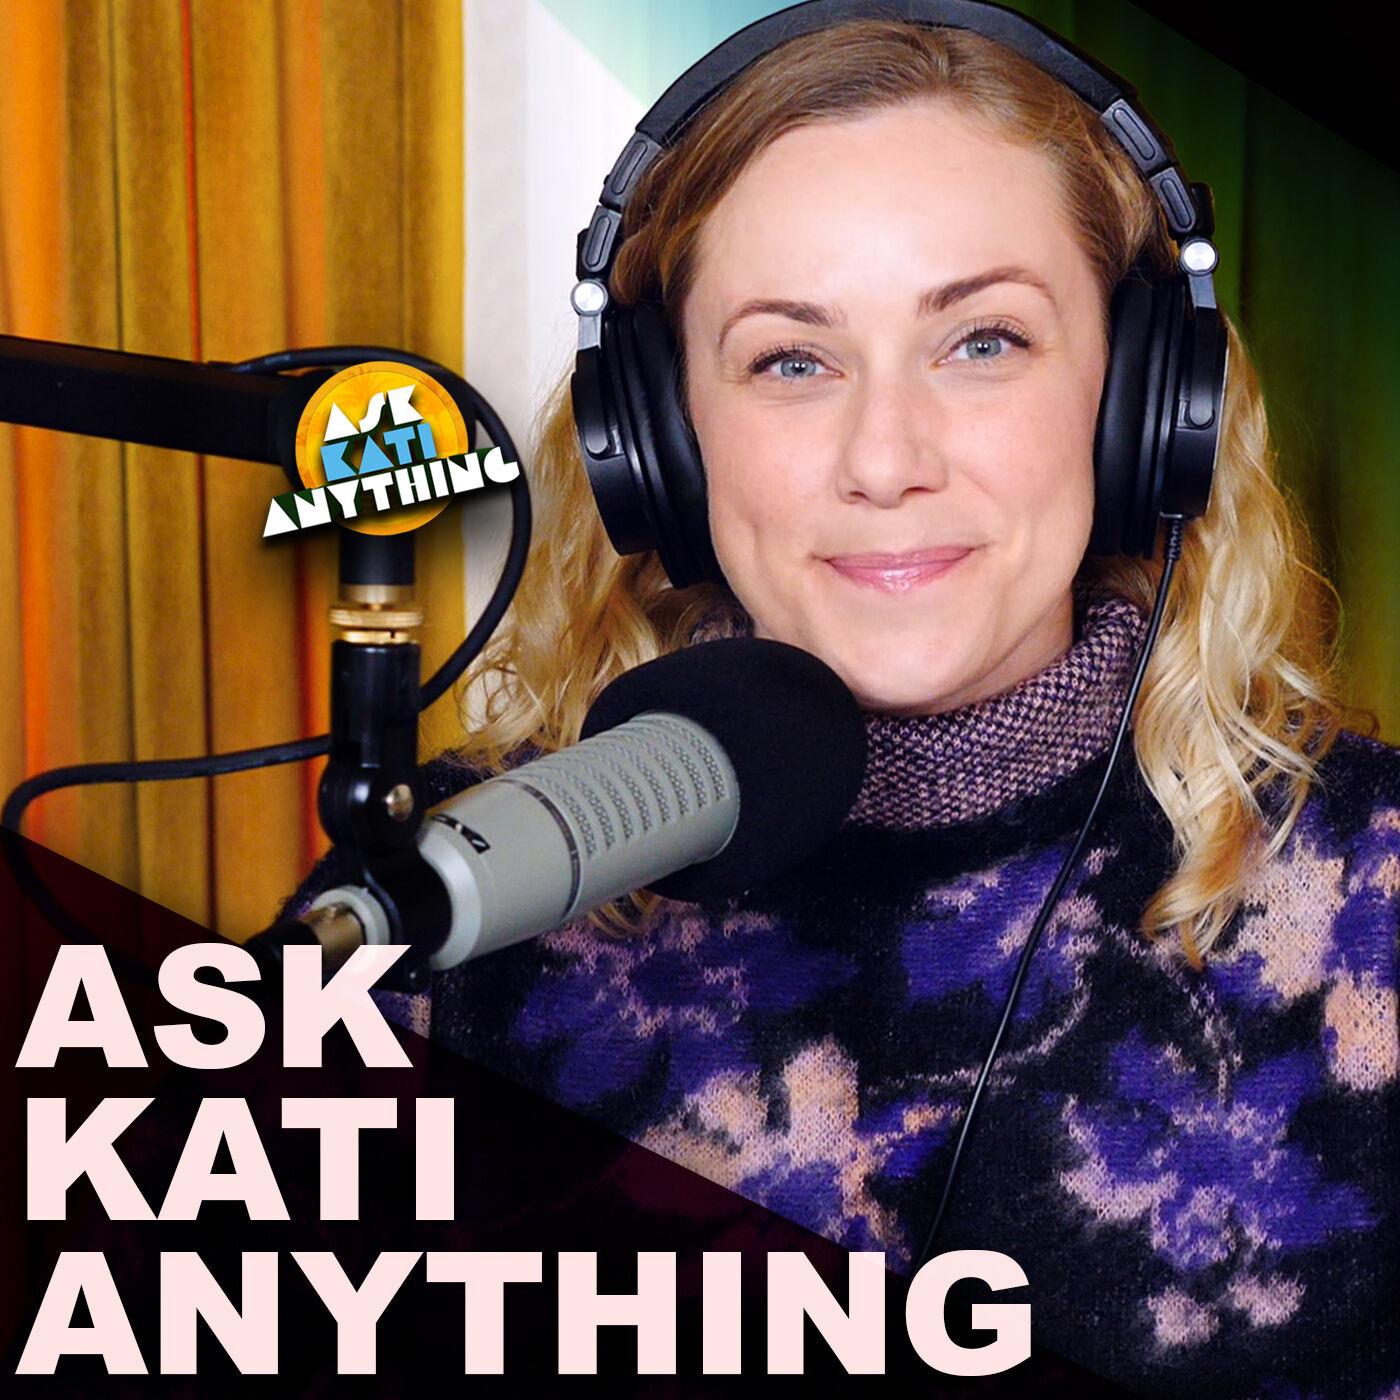 Ask Kati Anything